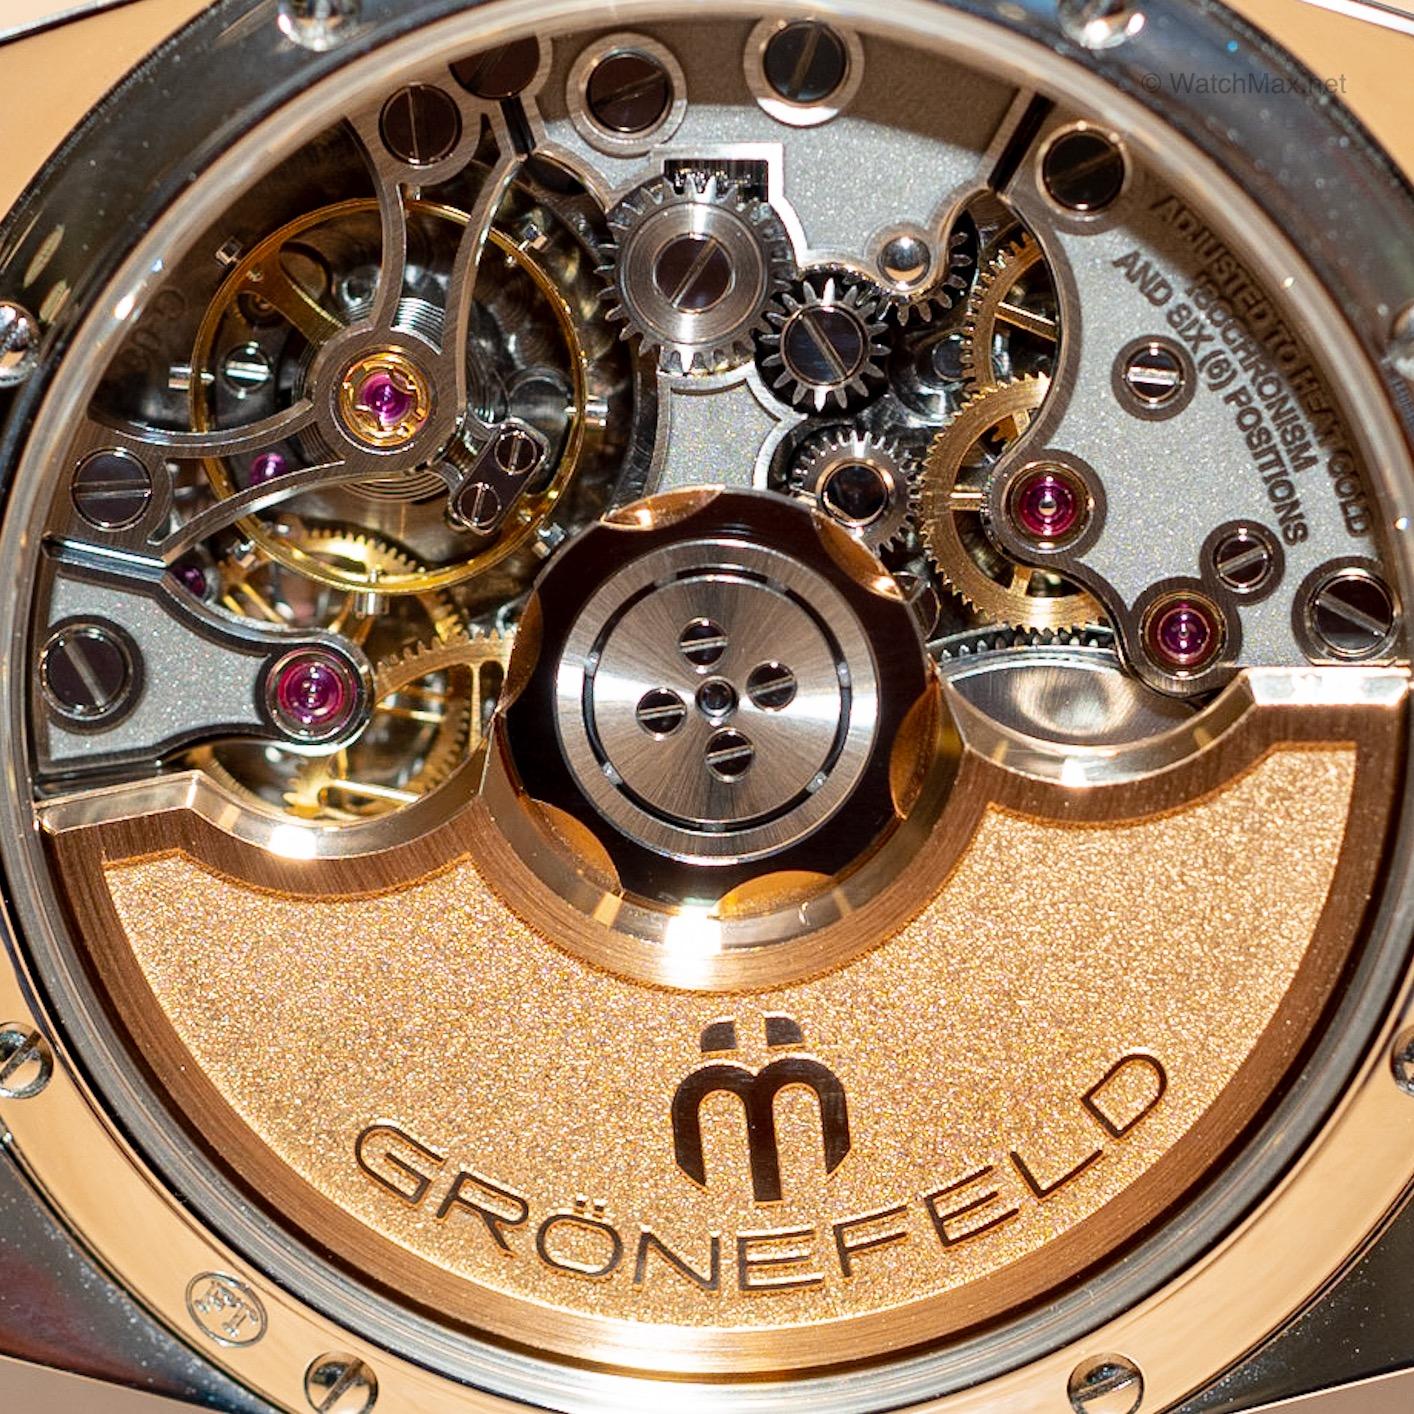 gronefeld-principia-watch-sihh-2019-9.jpg